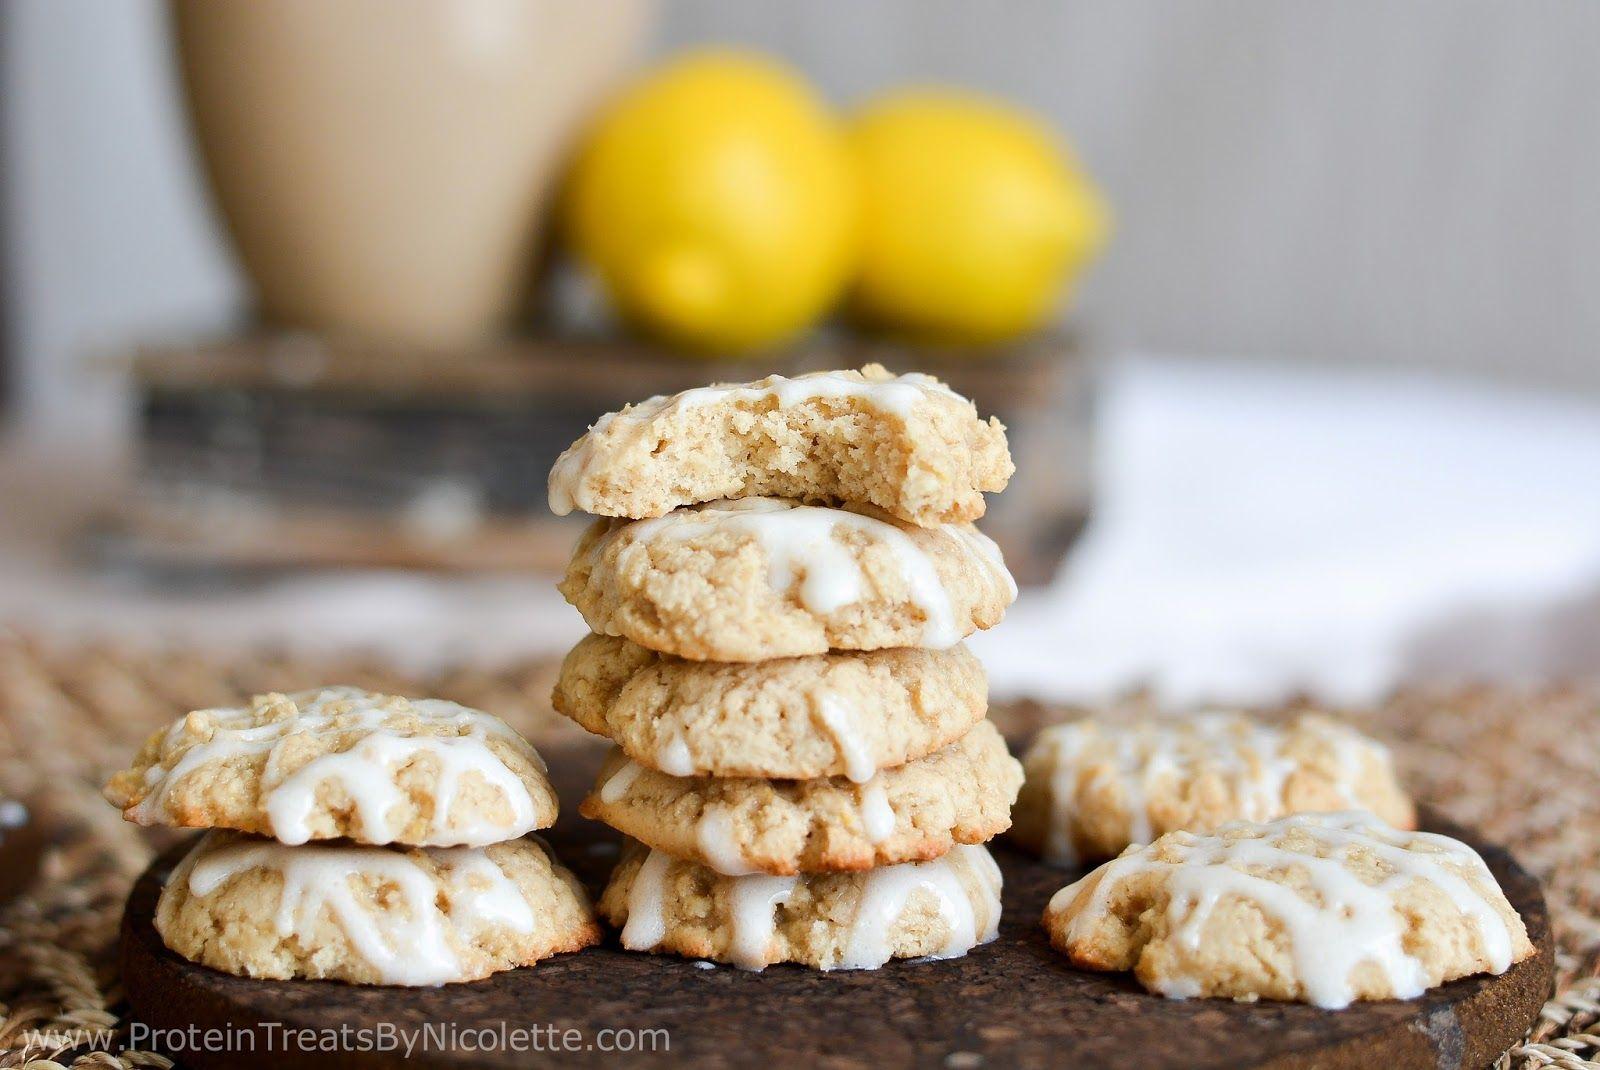 Protein Treats By Nicolette : Glazed Lemon Protein Sugar Cookies